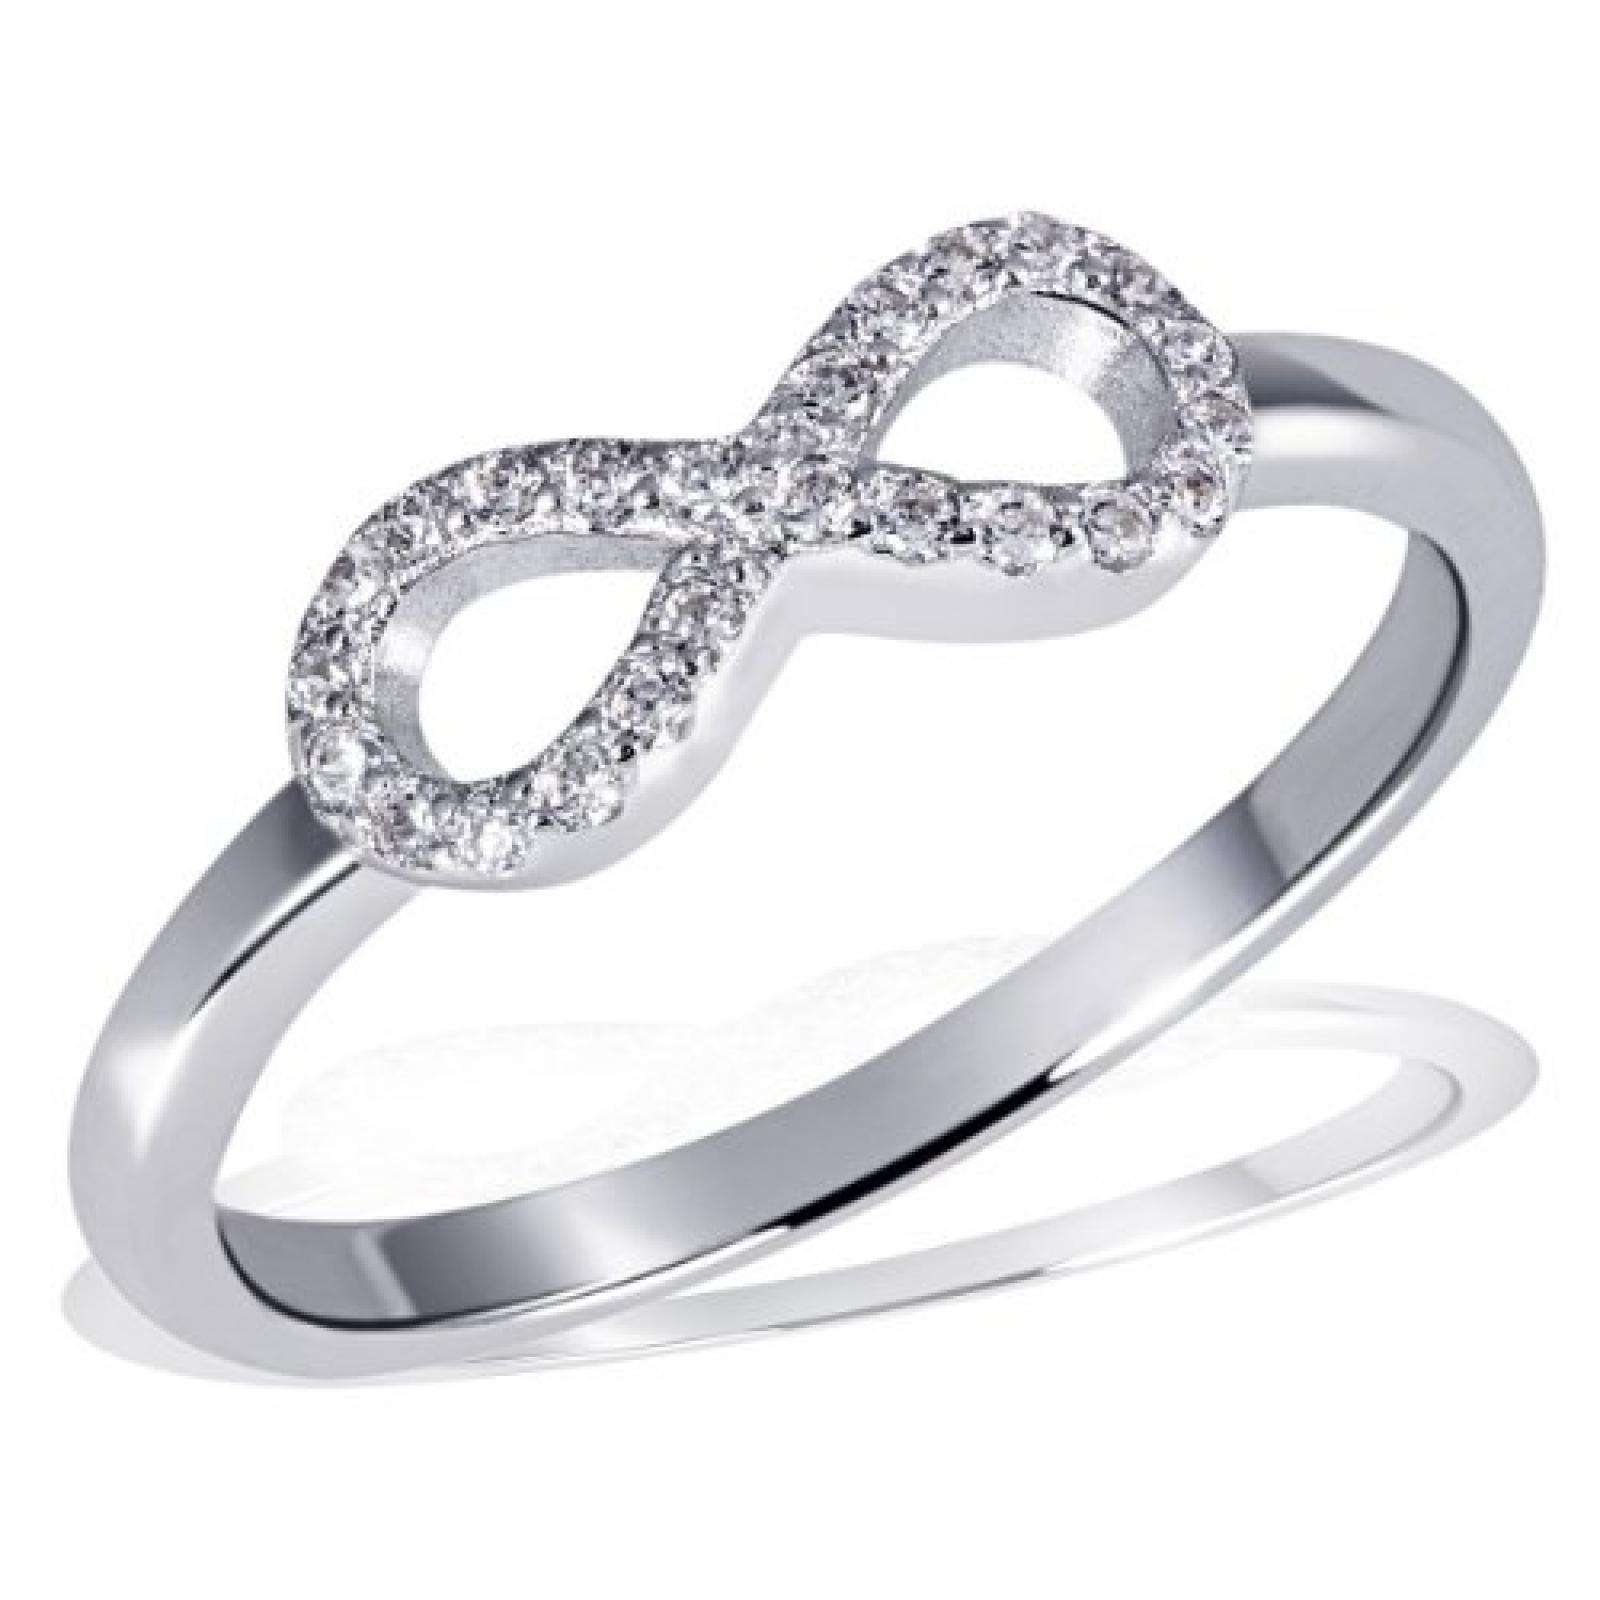 Goldmaid Damen-Ring 925 Sterling Silber Zirkonia weiß  Fo R62S